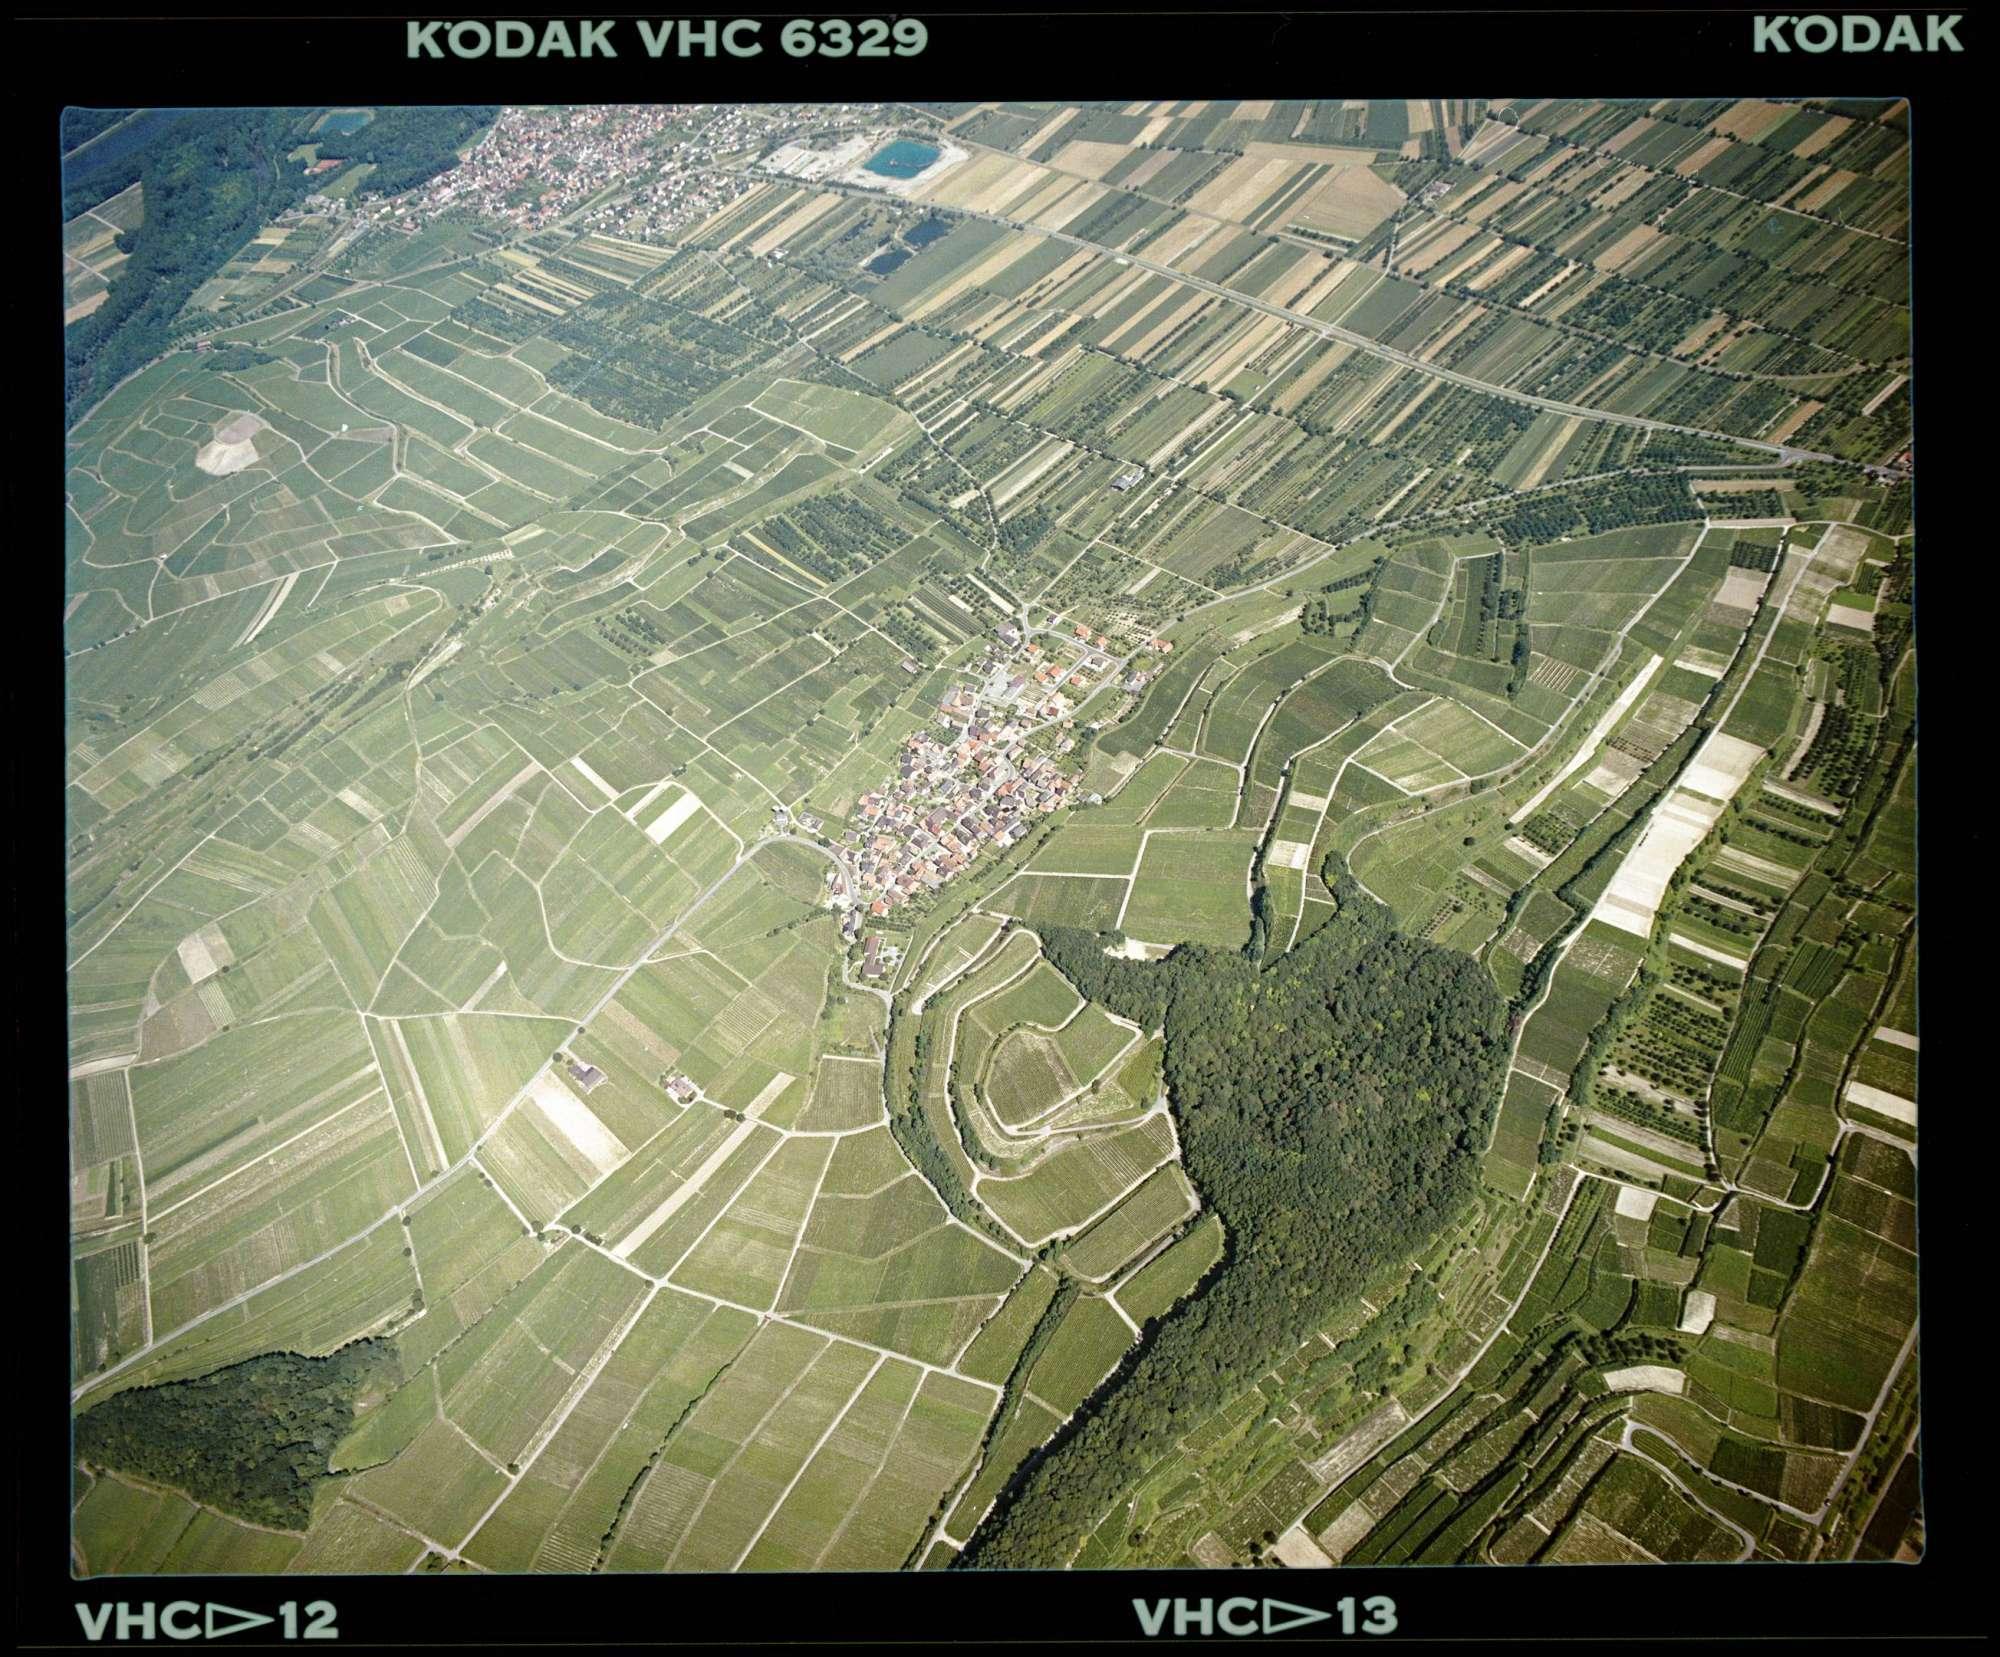 Leiselheim, Luftbild, Bild 1